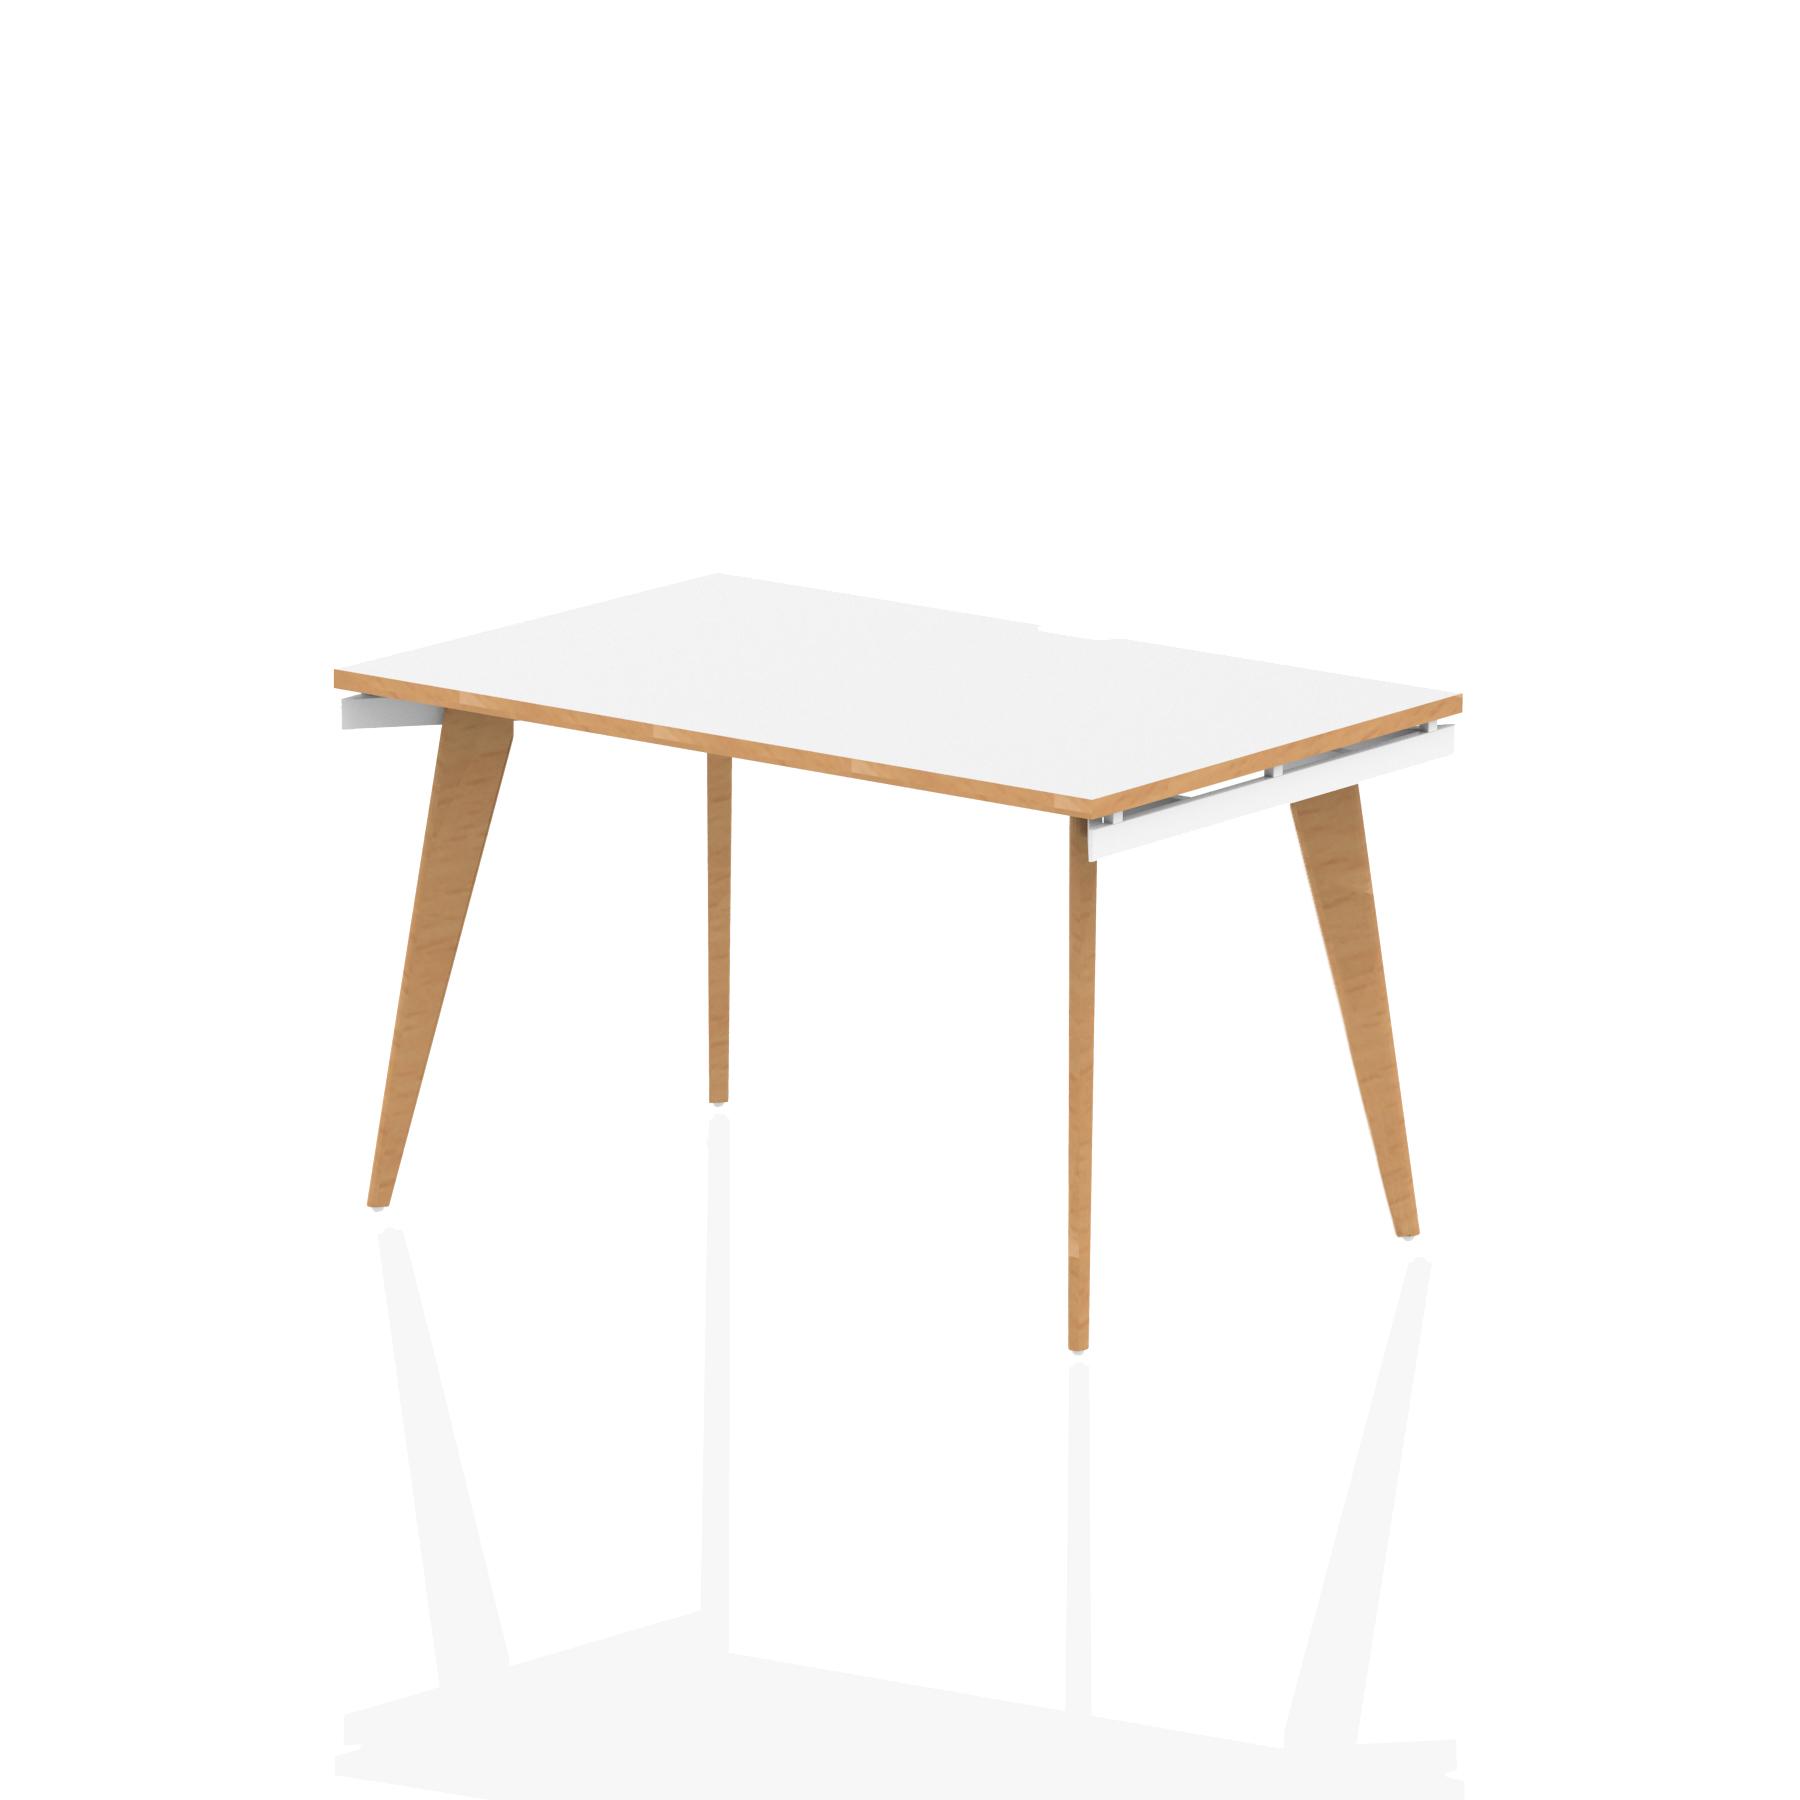 Oslo Single White Frame Wooden Leg Bench Desk 1200 White With Natural Wood Edge